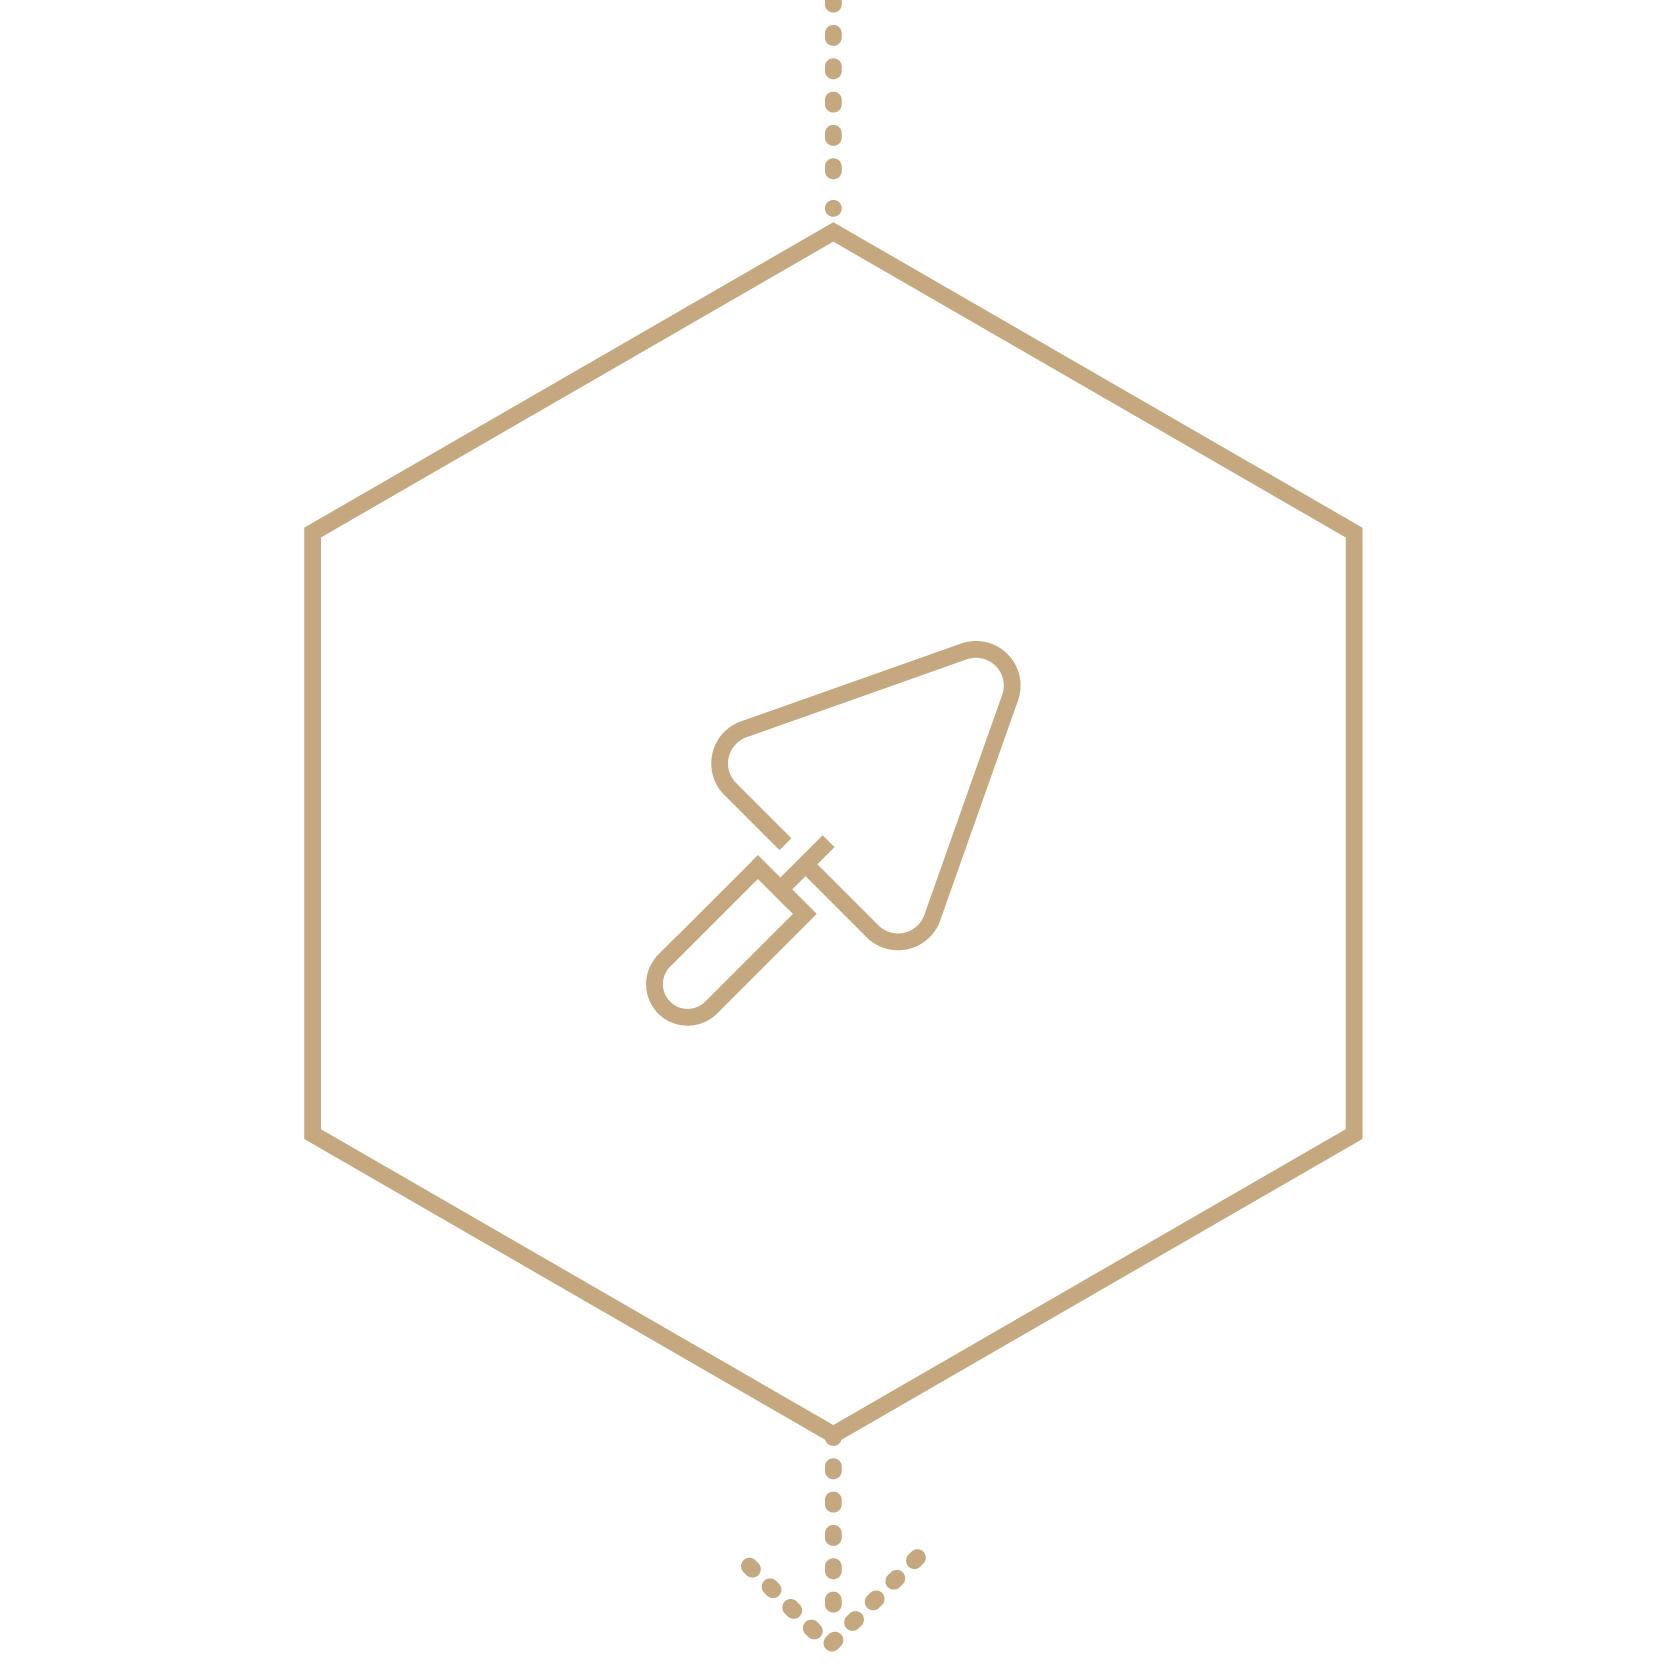 icon-set-lijntje-05.png